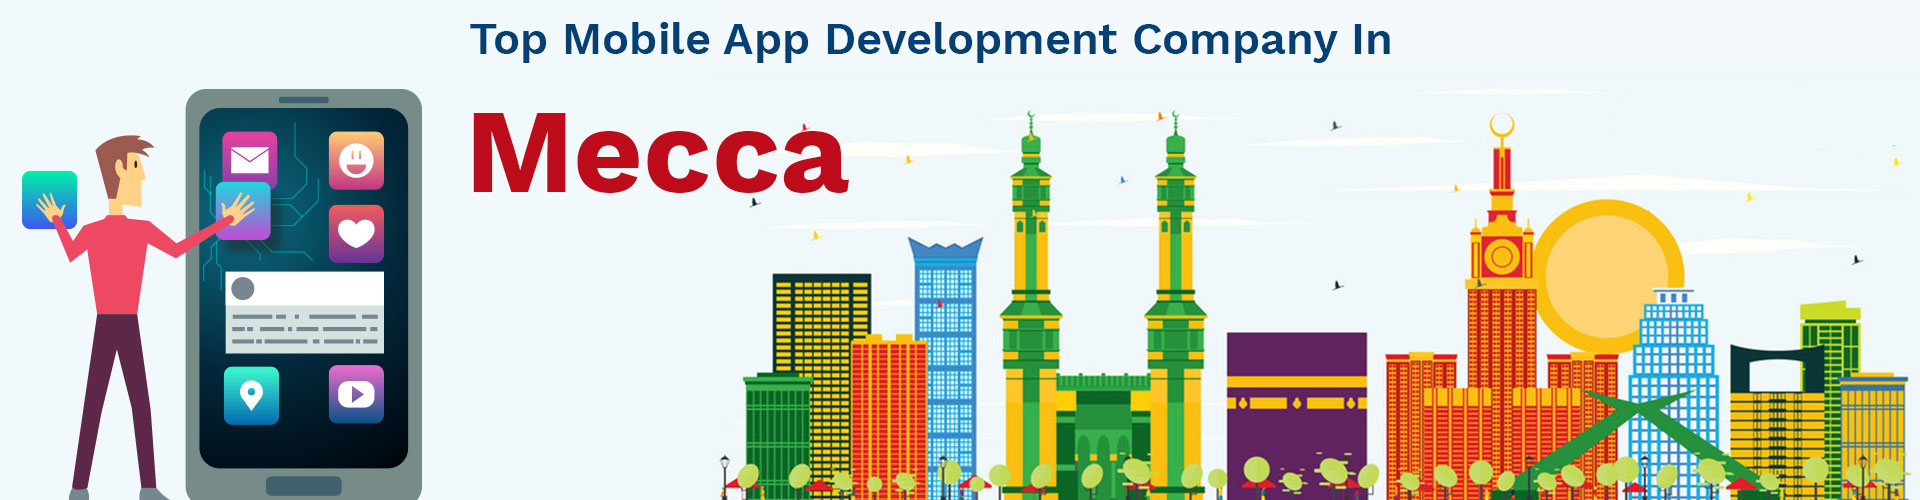 mobile app development company mecca